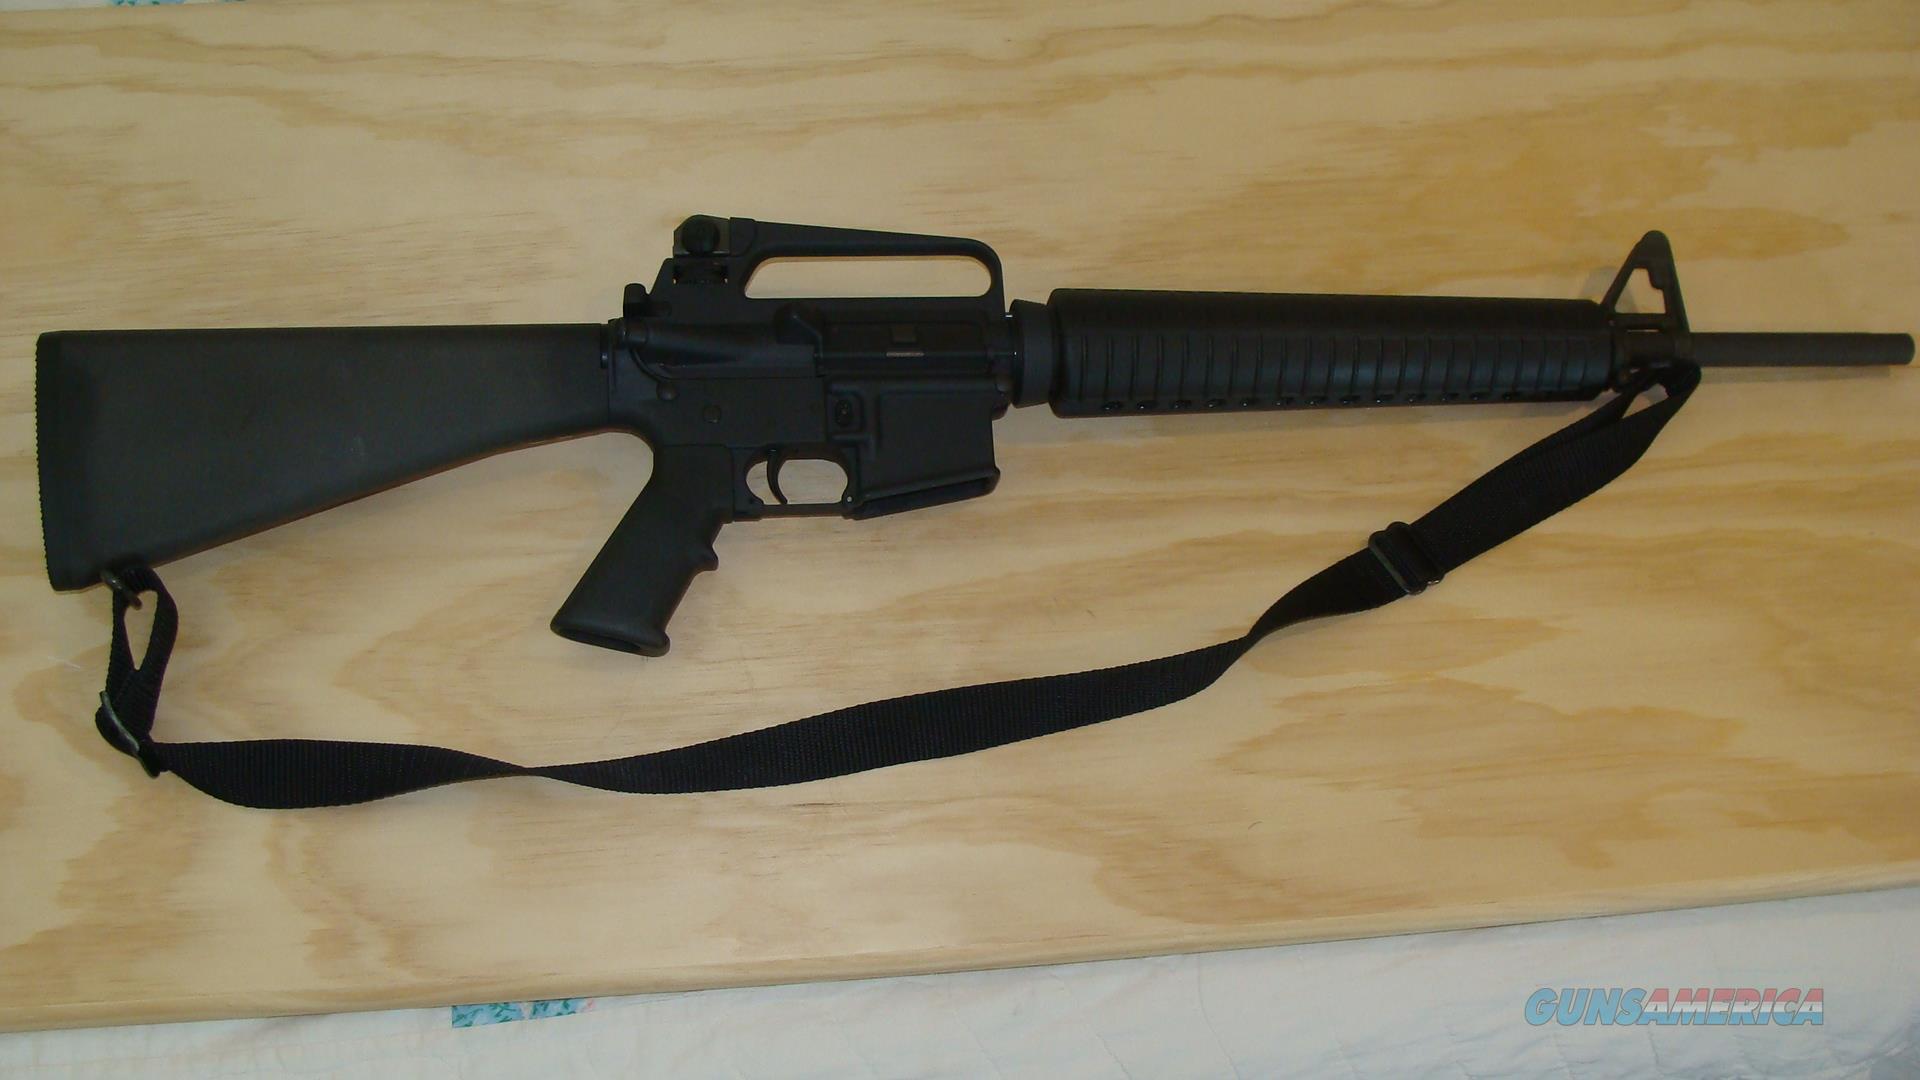 Colt AR-15 Match Target Rifle  Guns > Rifles > Colt Military/Tactical Rifles